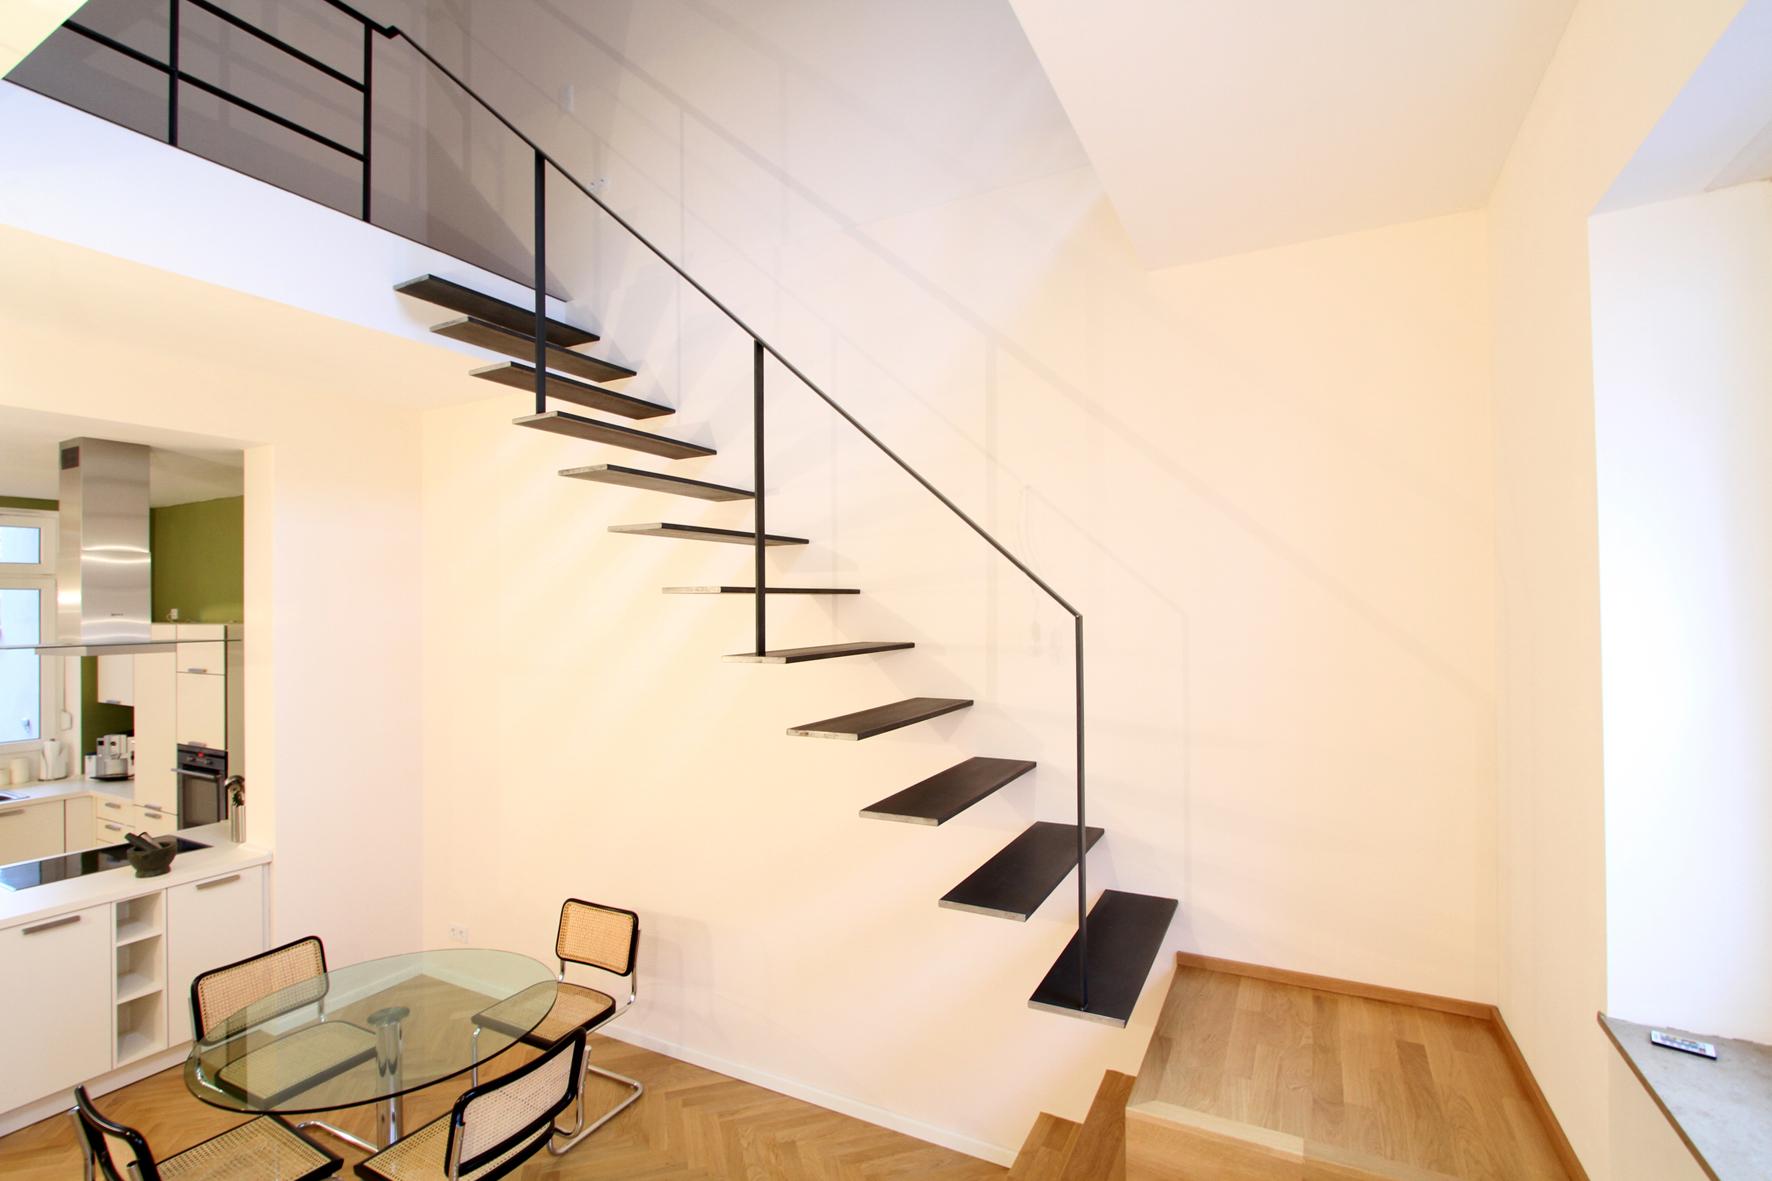 Treppen Design treppen.de präsentiert design • treppen